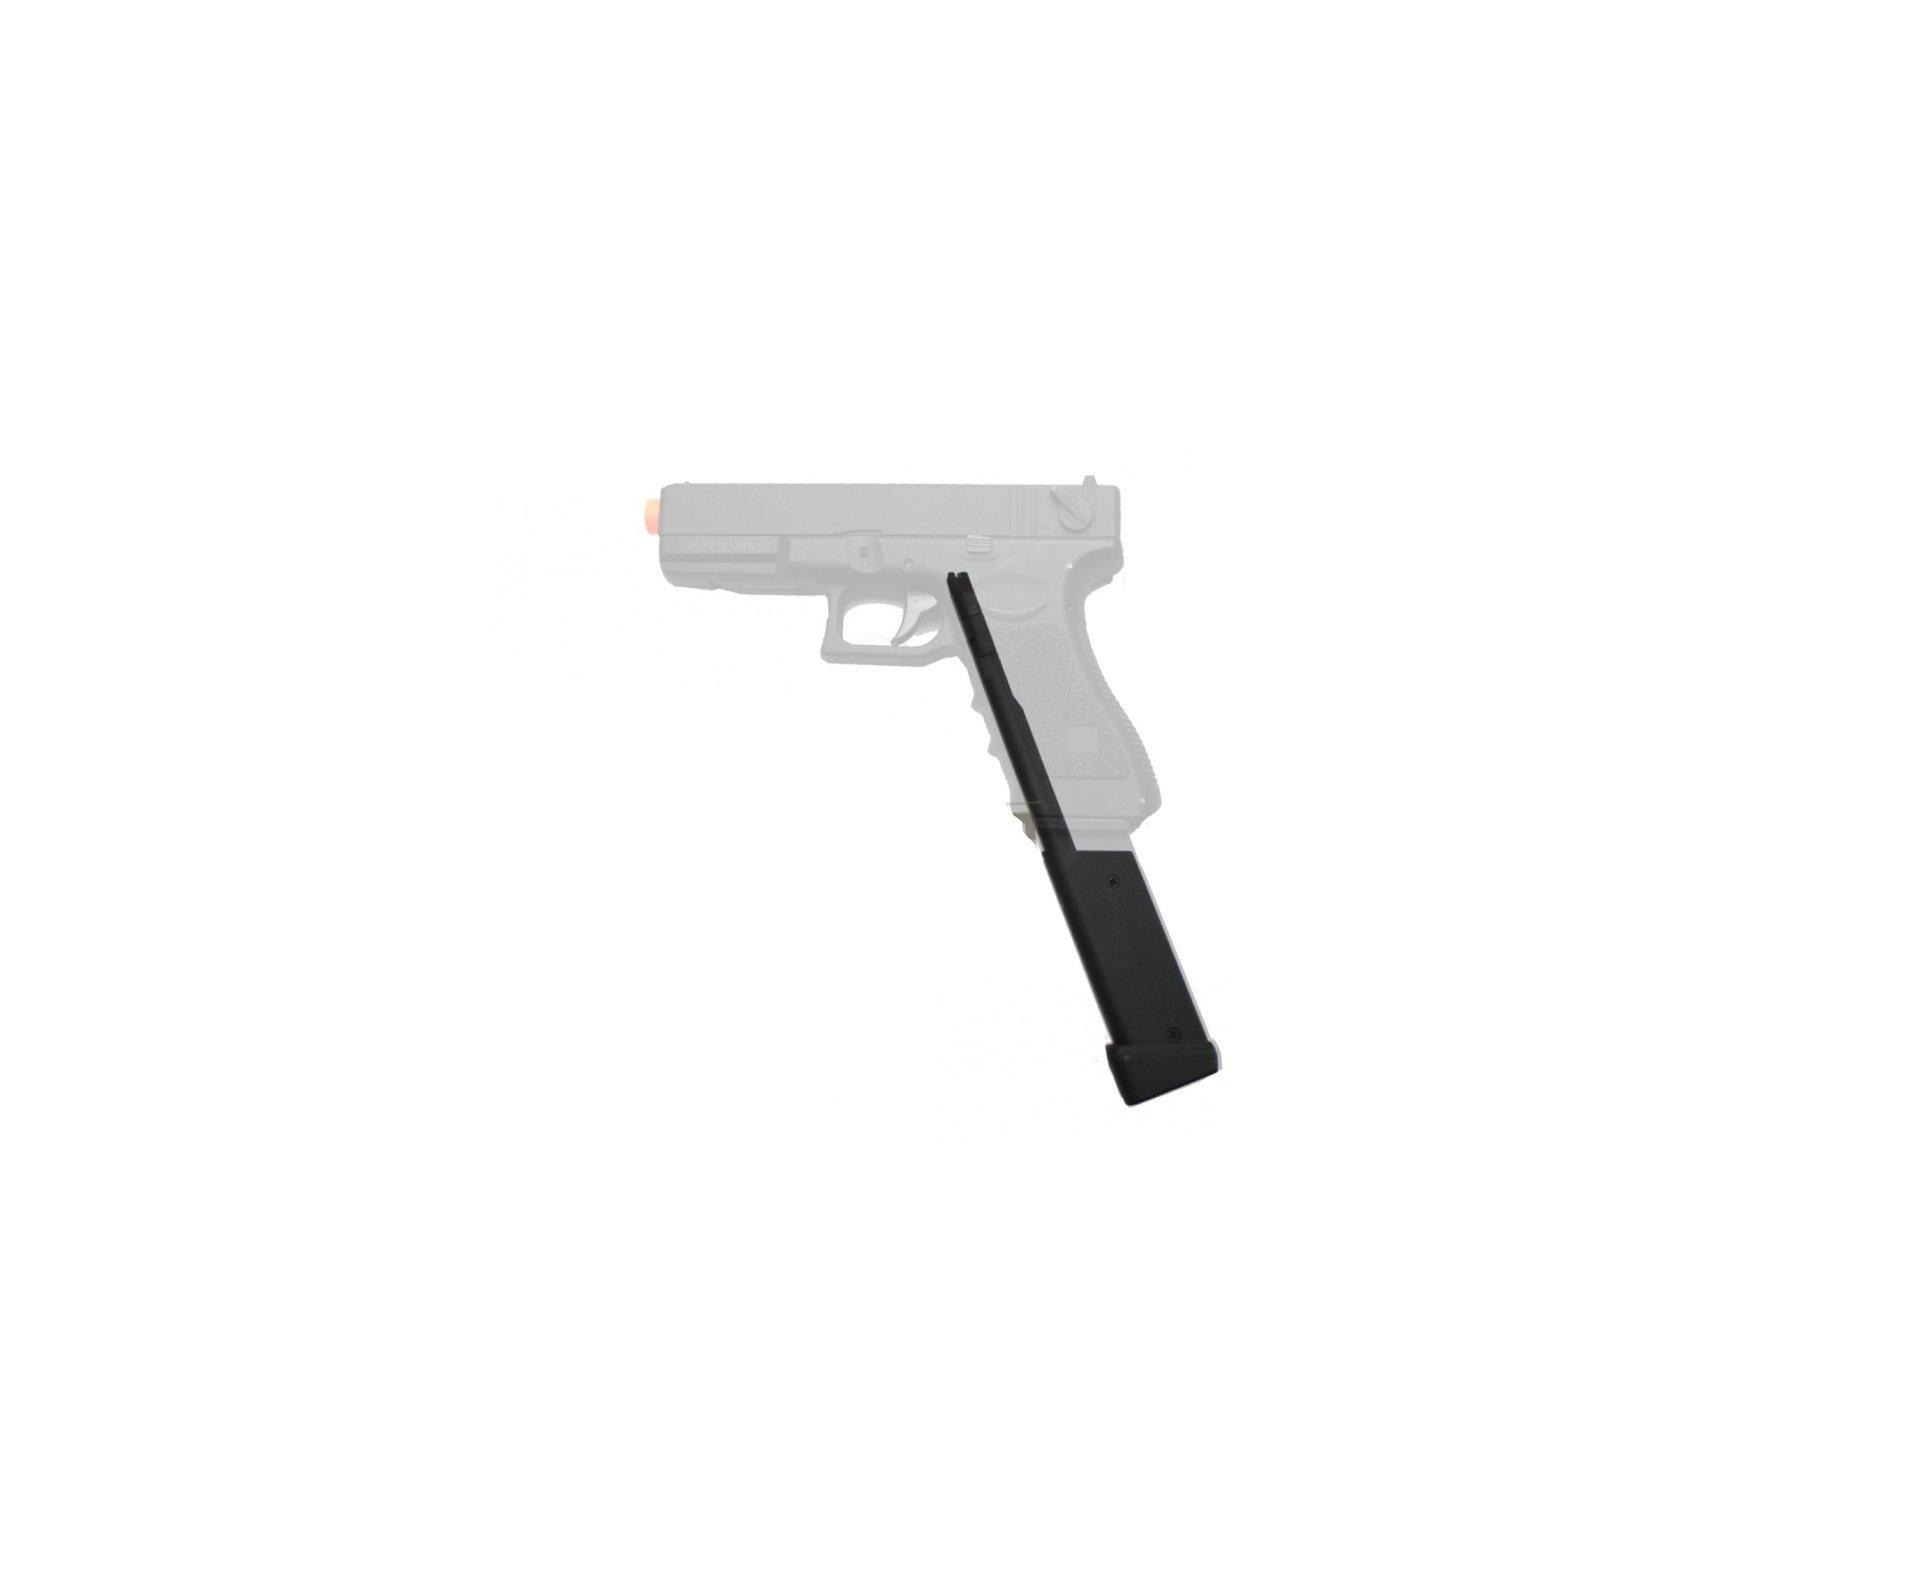 Magazine Estendido Para Pistola Glock / P226 E 1911 Cyma (cap 100 Bbs) - Cyma